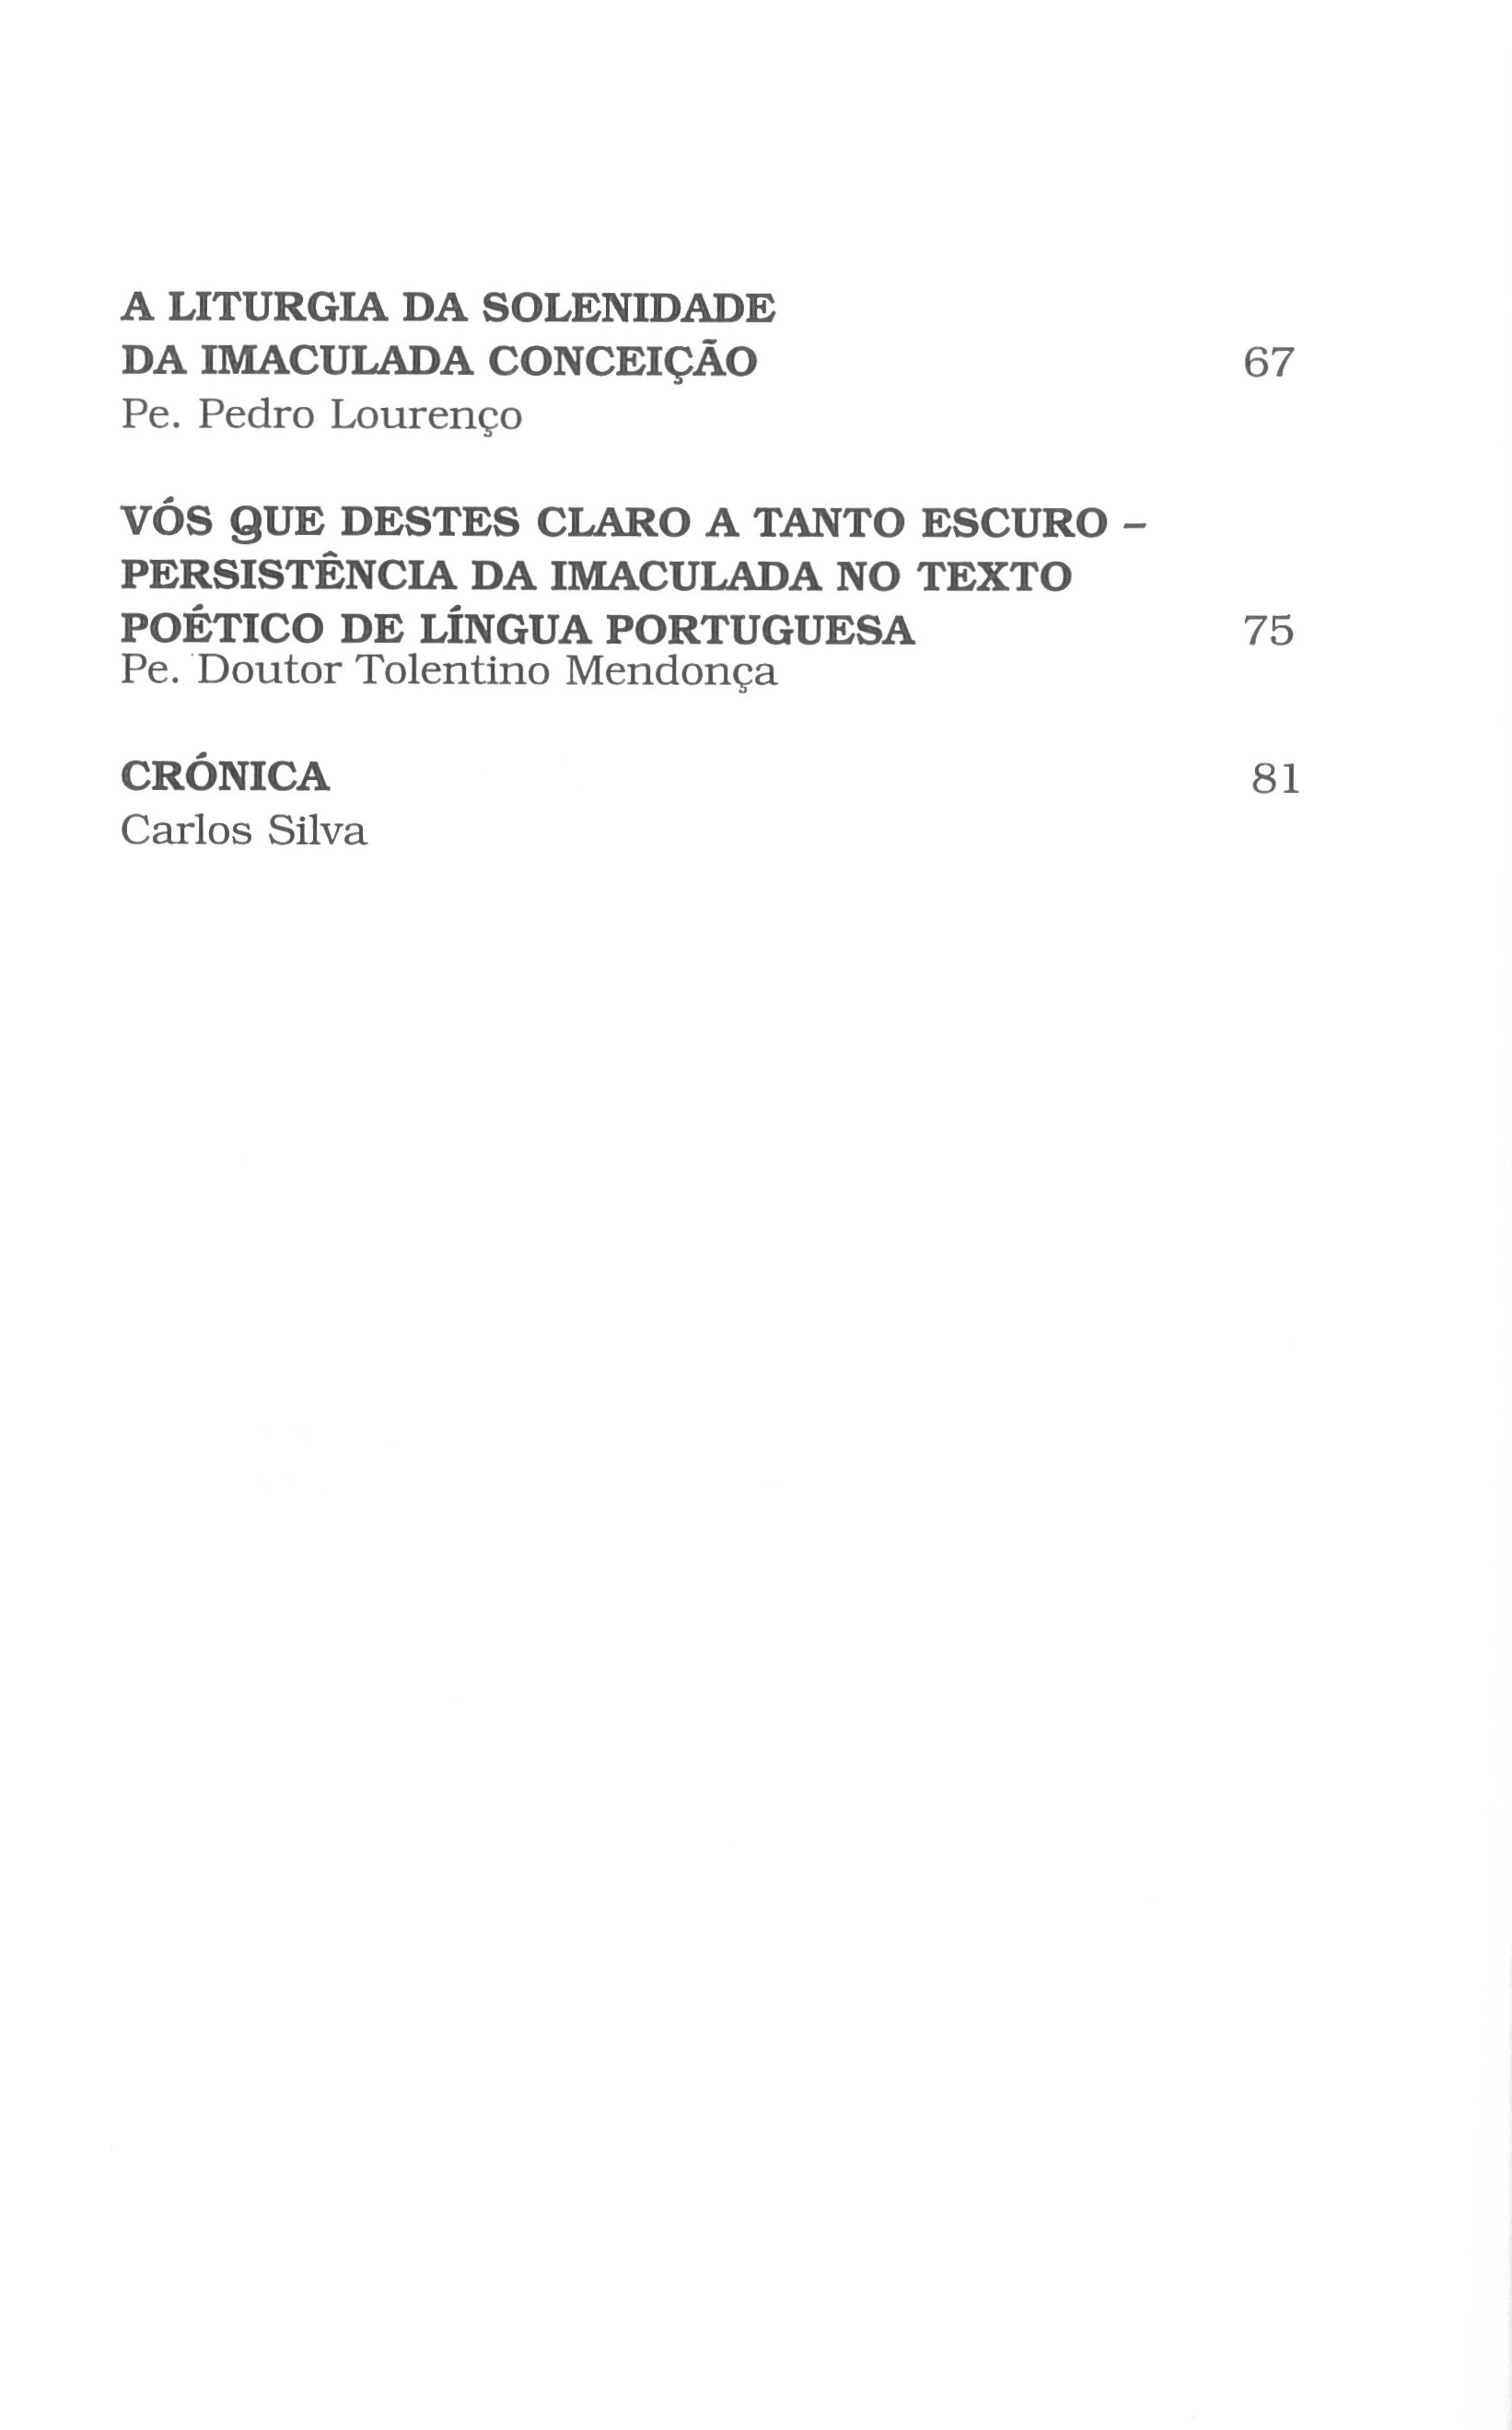 Revista Novellae Olivarum, nº 29 - Novembro de 2004 (índice)